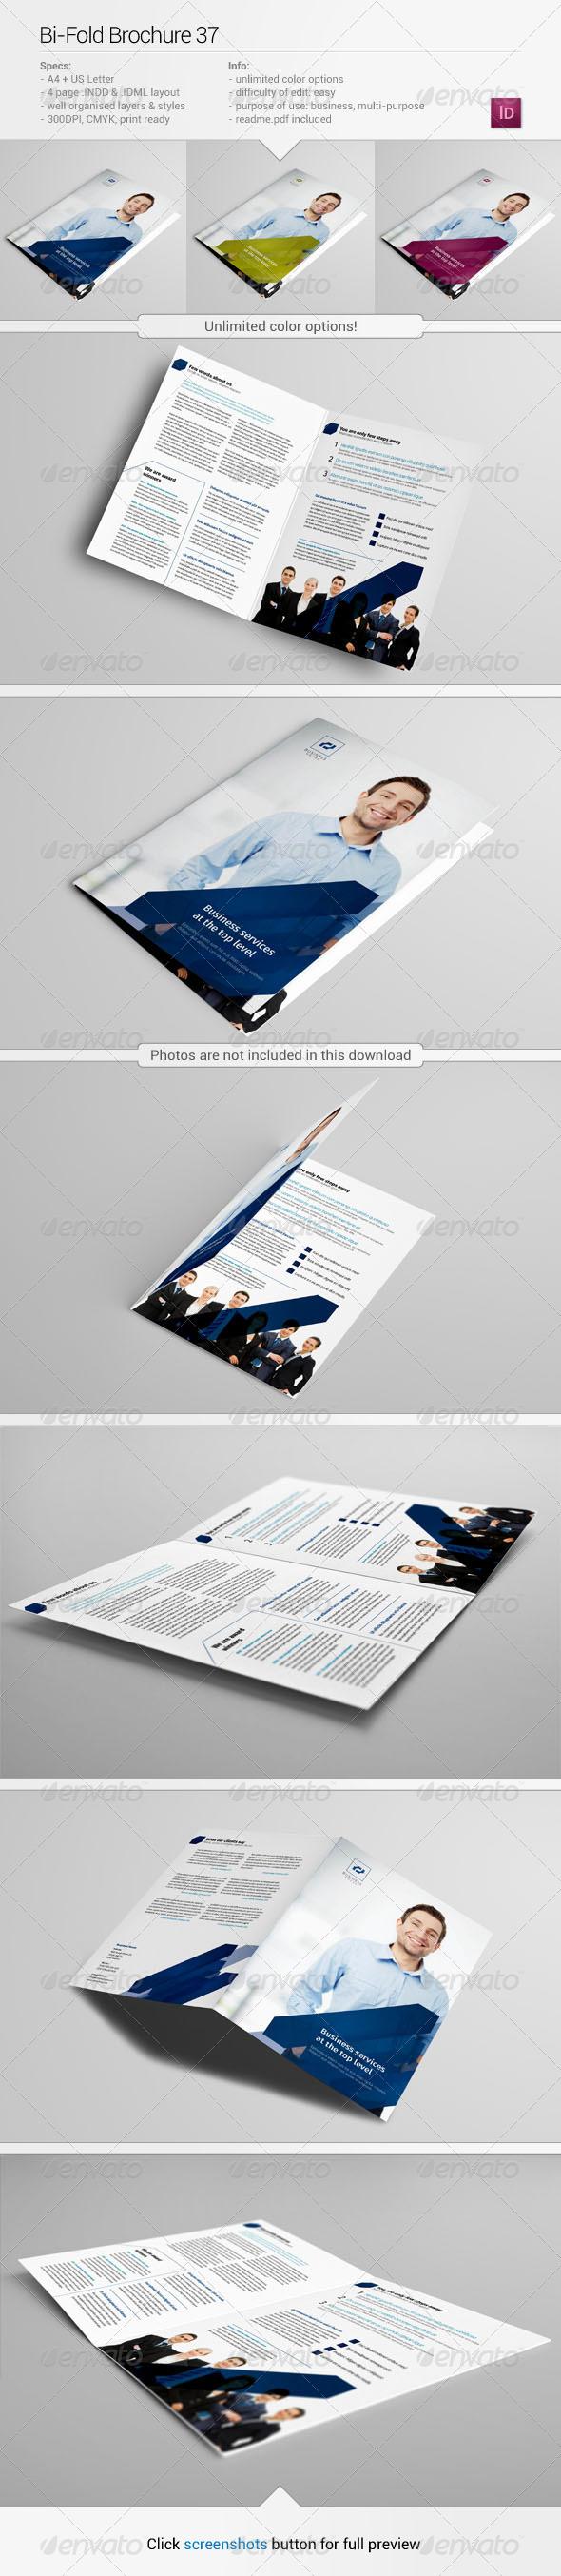 Bi-Fold Brochure 37 - Corporate Brochures